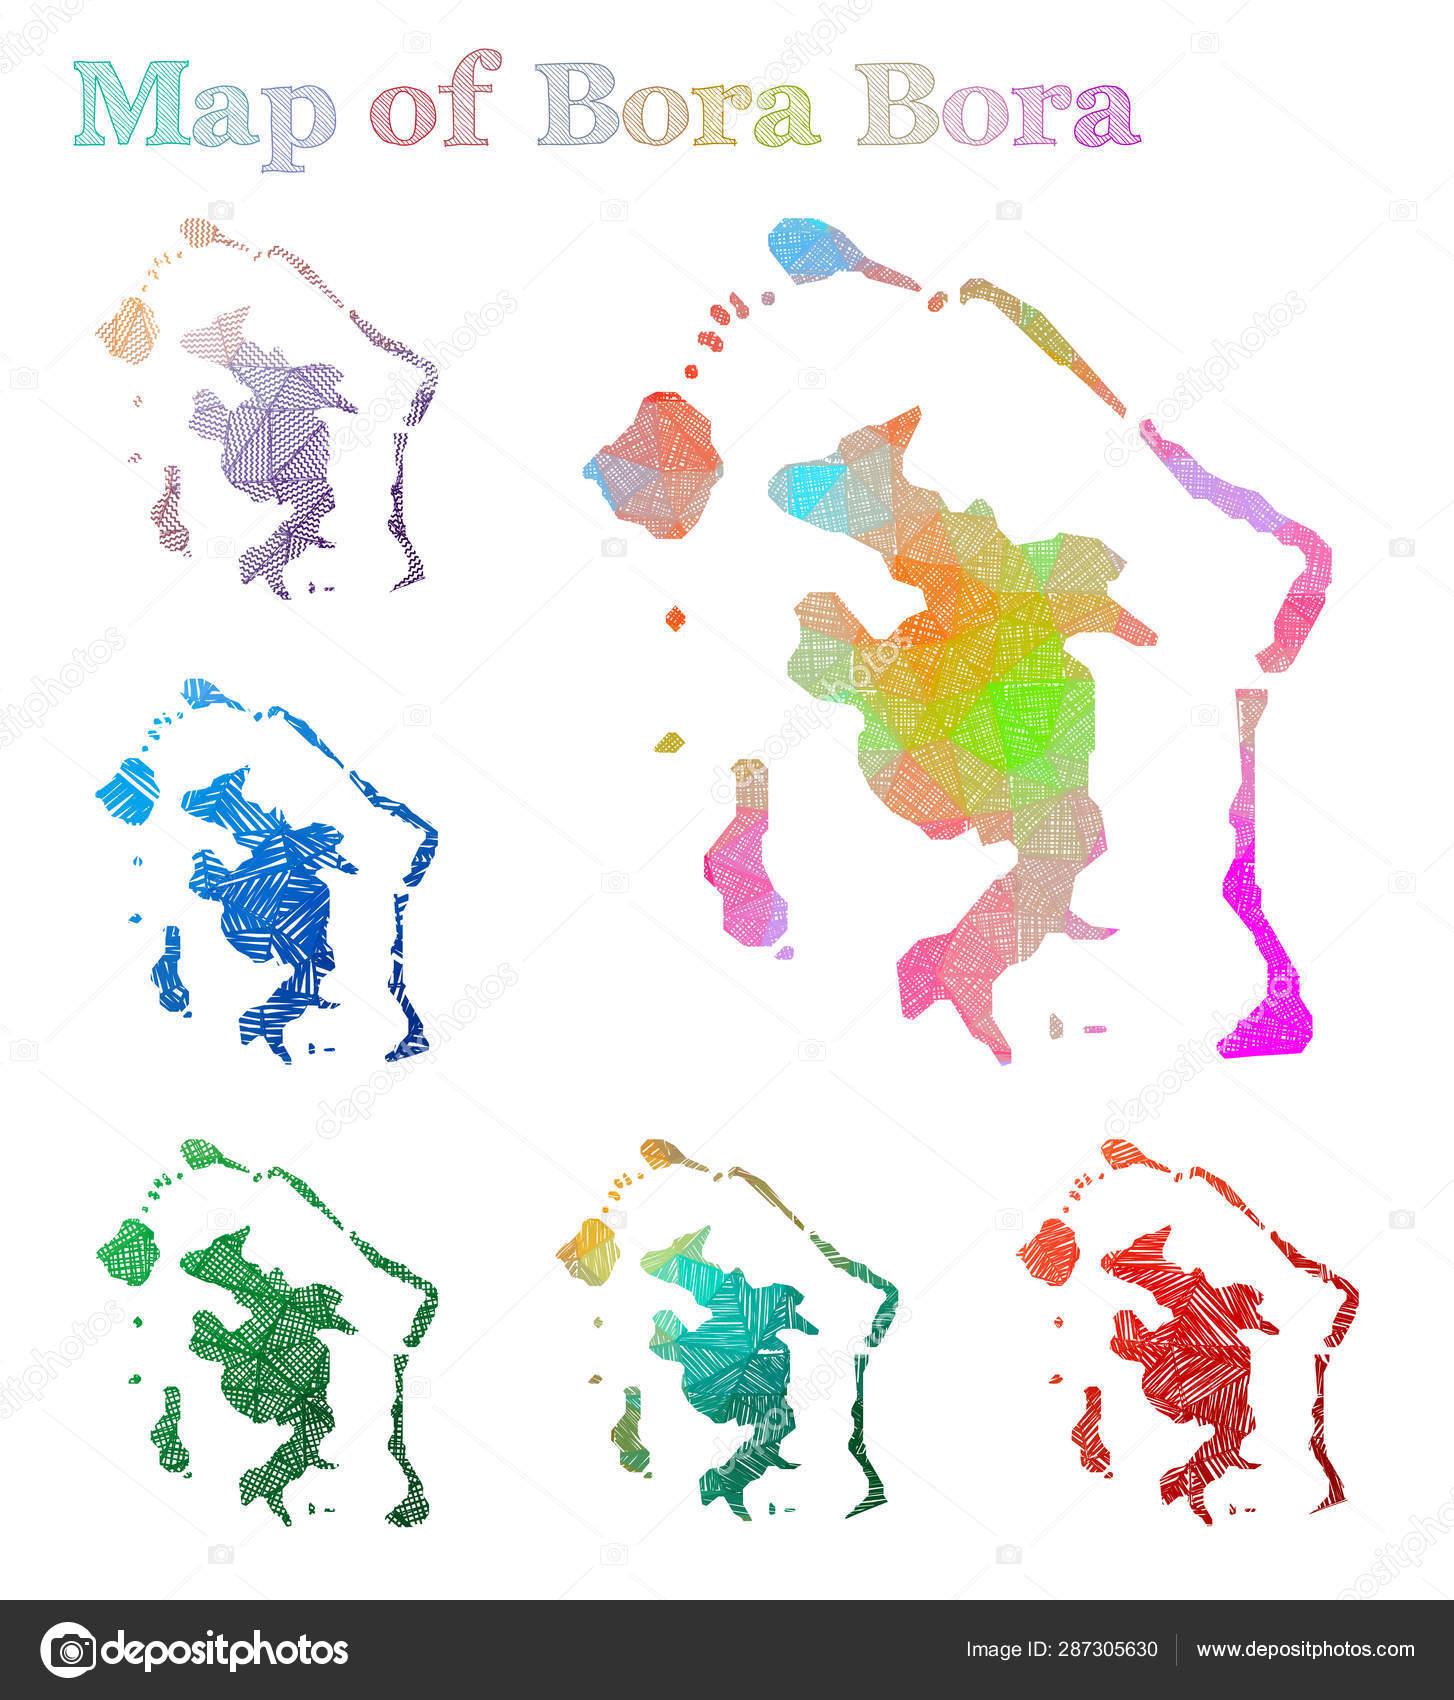 Handdrawn Map Of Bora Bora Colorful Island Shape Sketchy